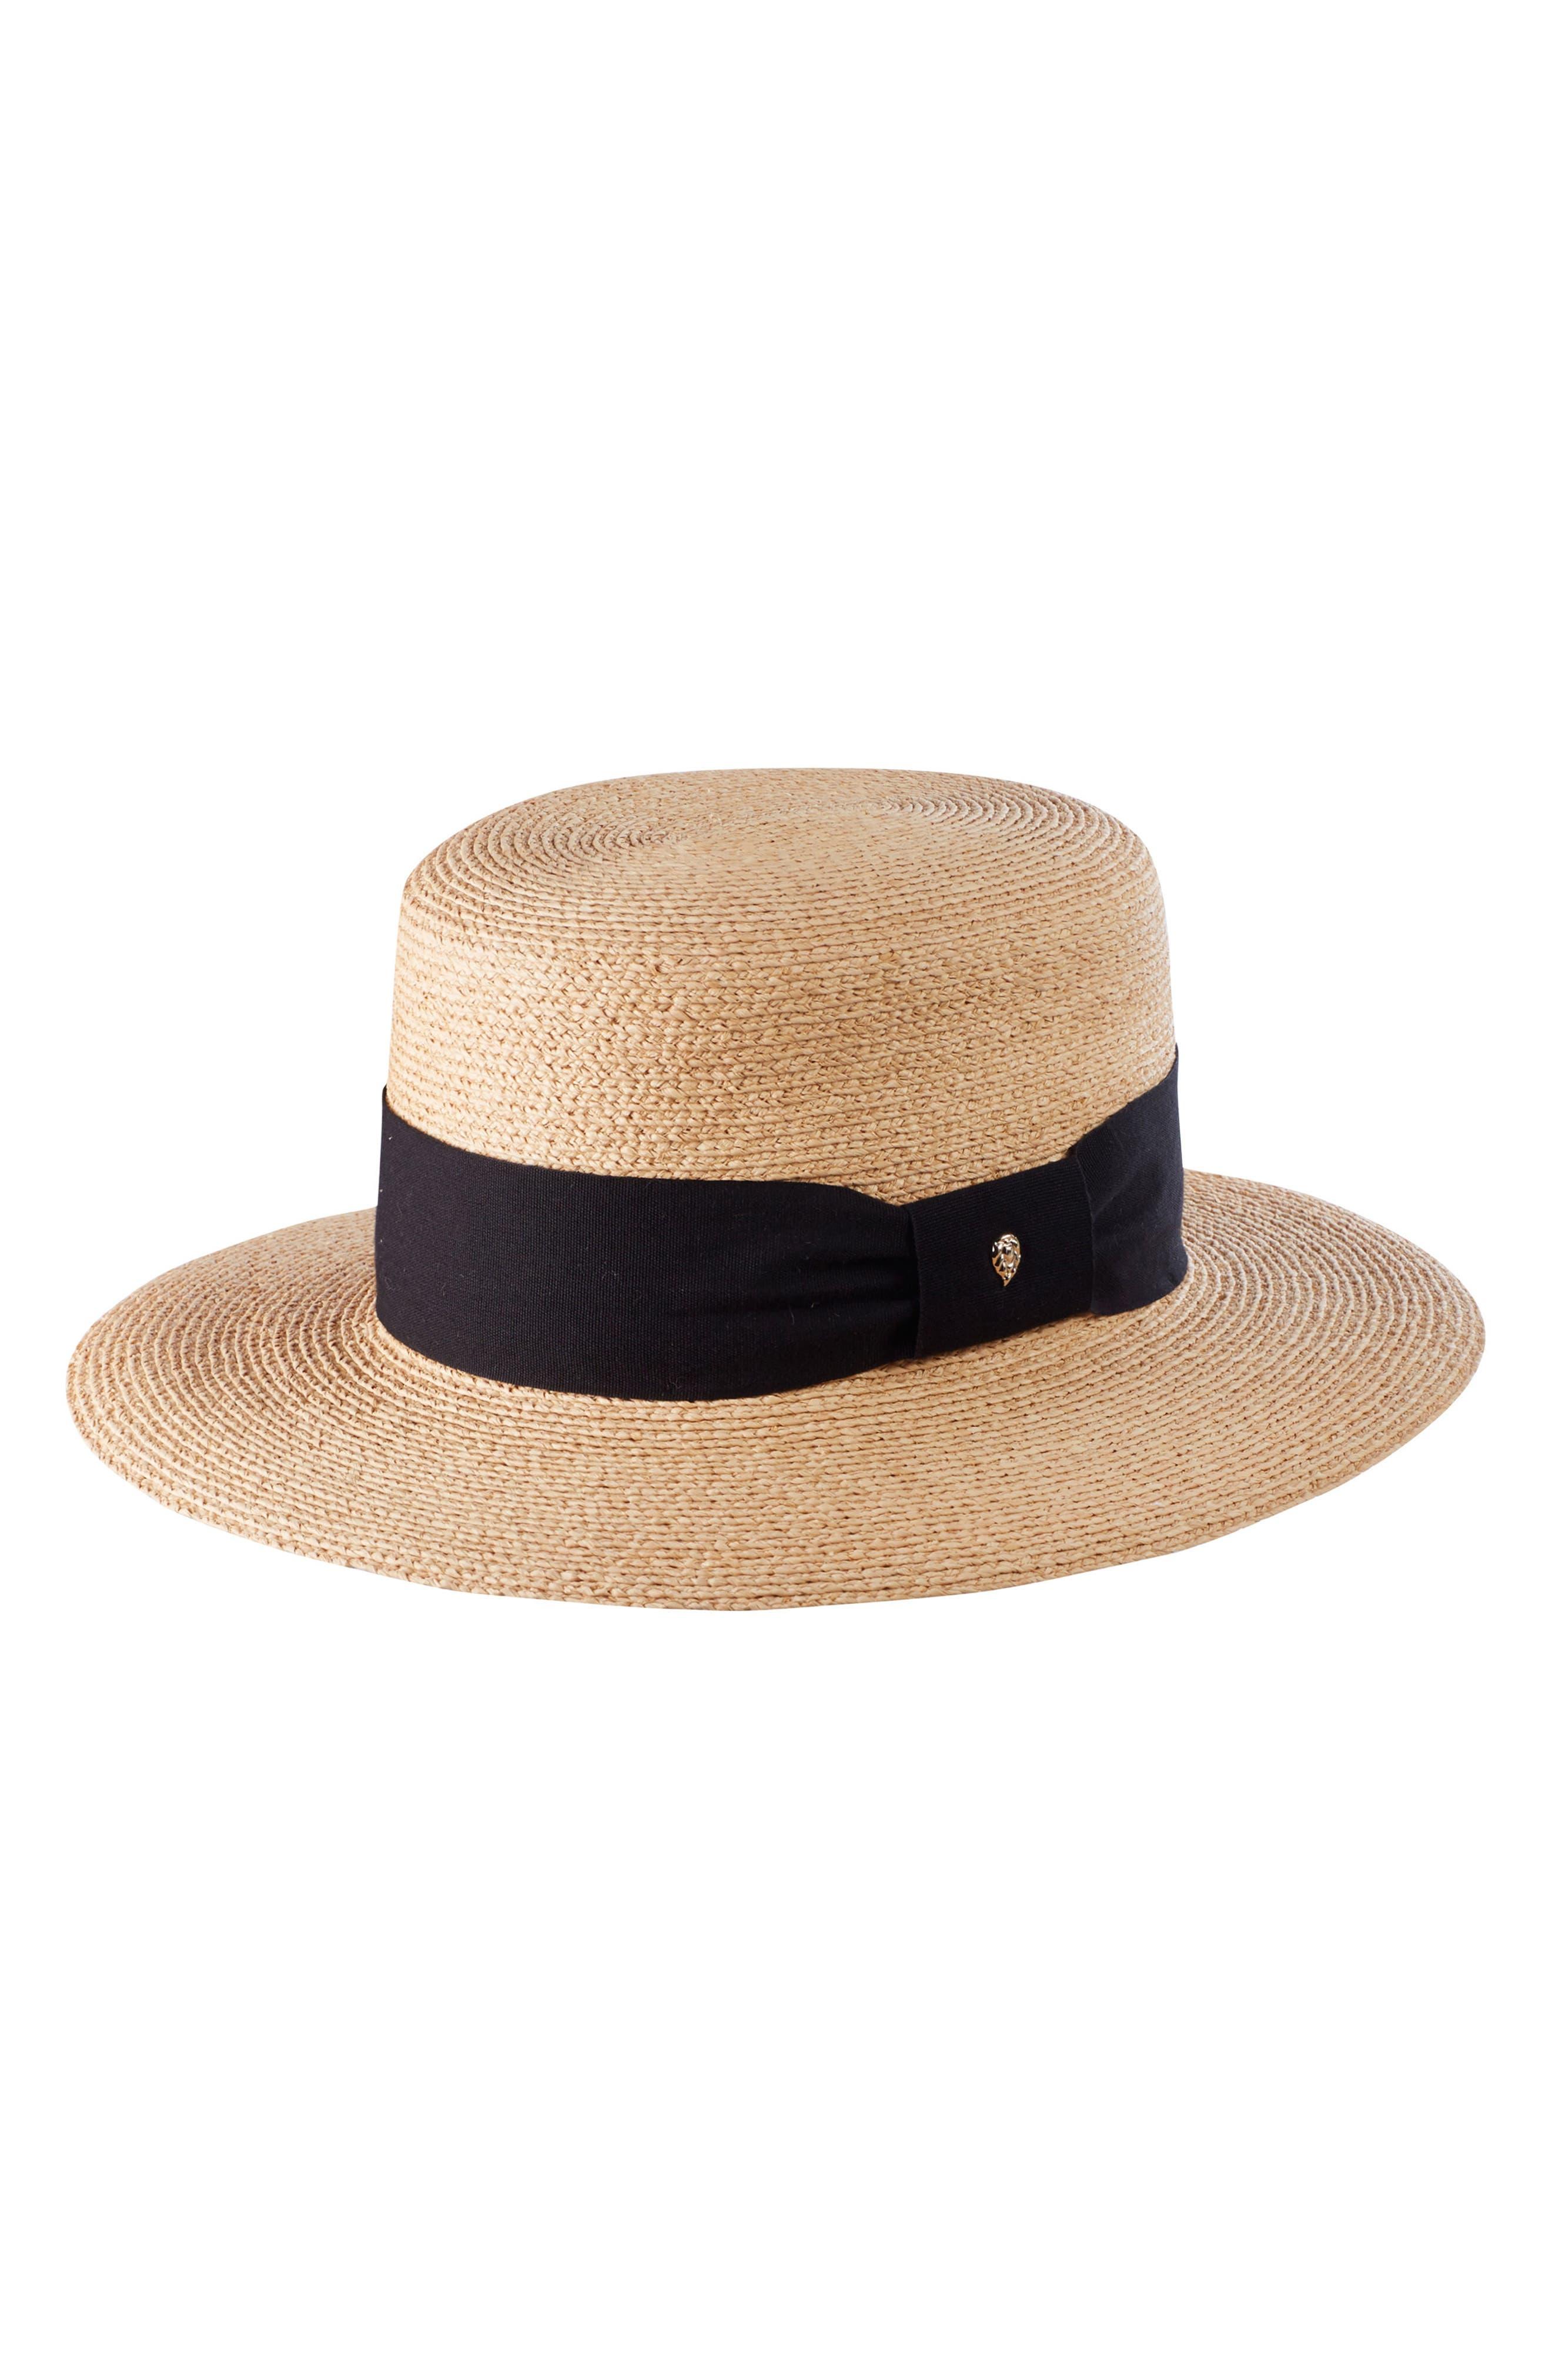 Braided Raffia Boater Hat,                             Alternate thumbnail 2, color,                             Natural/ Black